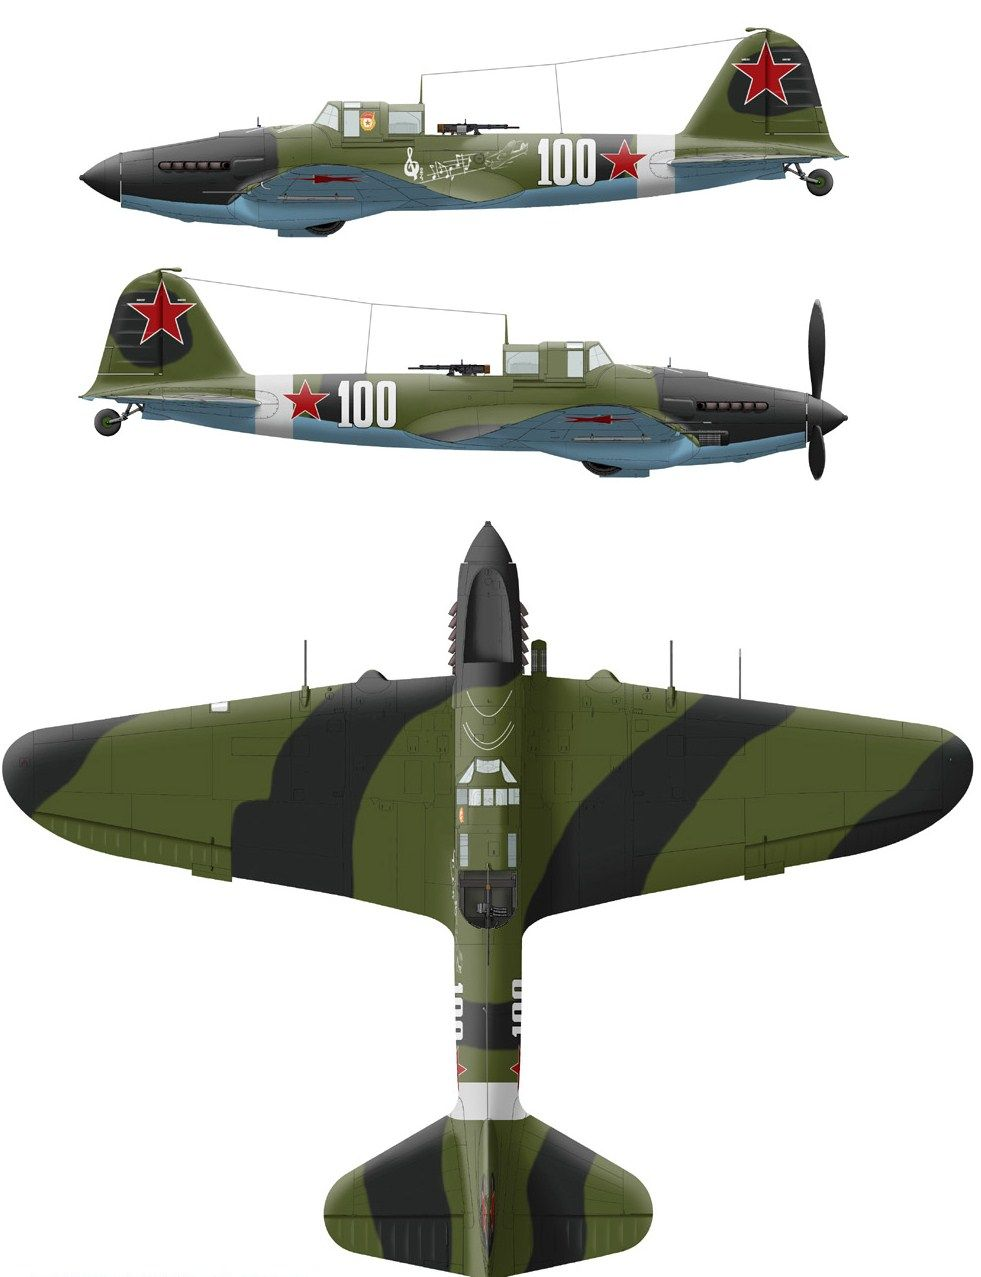 2 100 7 airplane artaviation artaeroplanesair forcewwiiaircraftto drawtanksworld